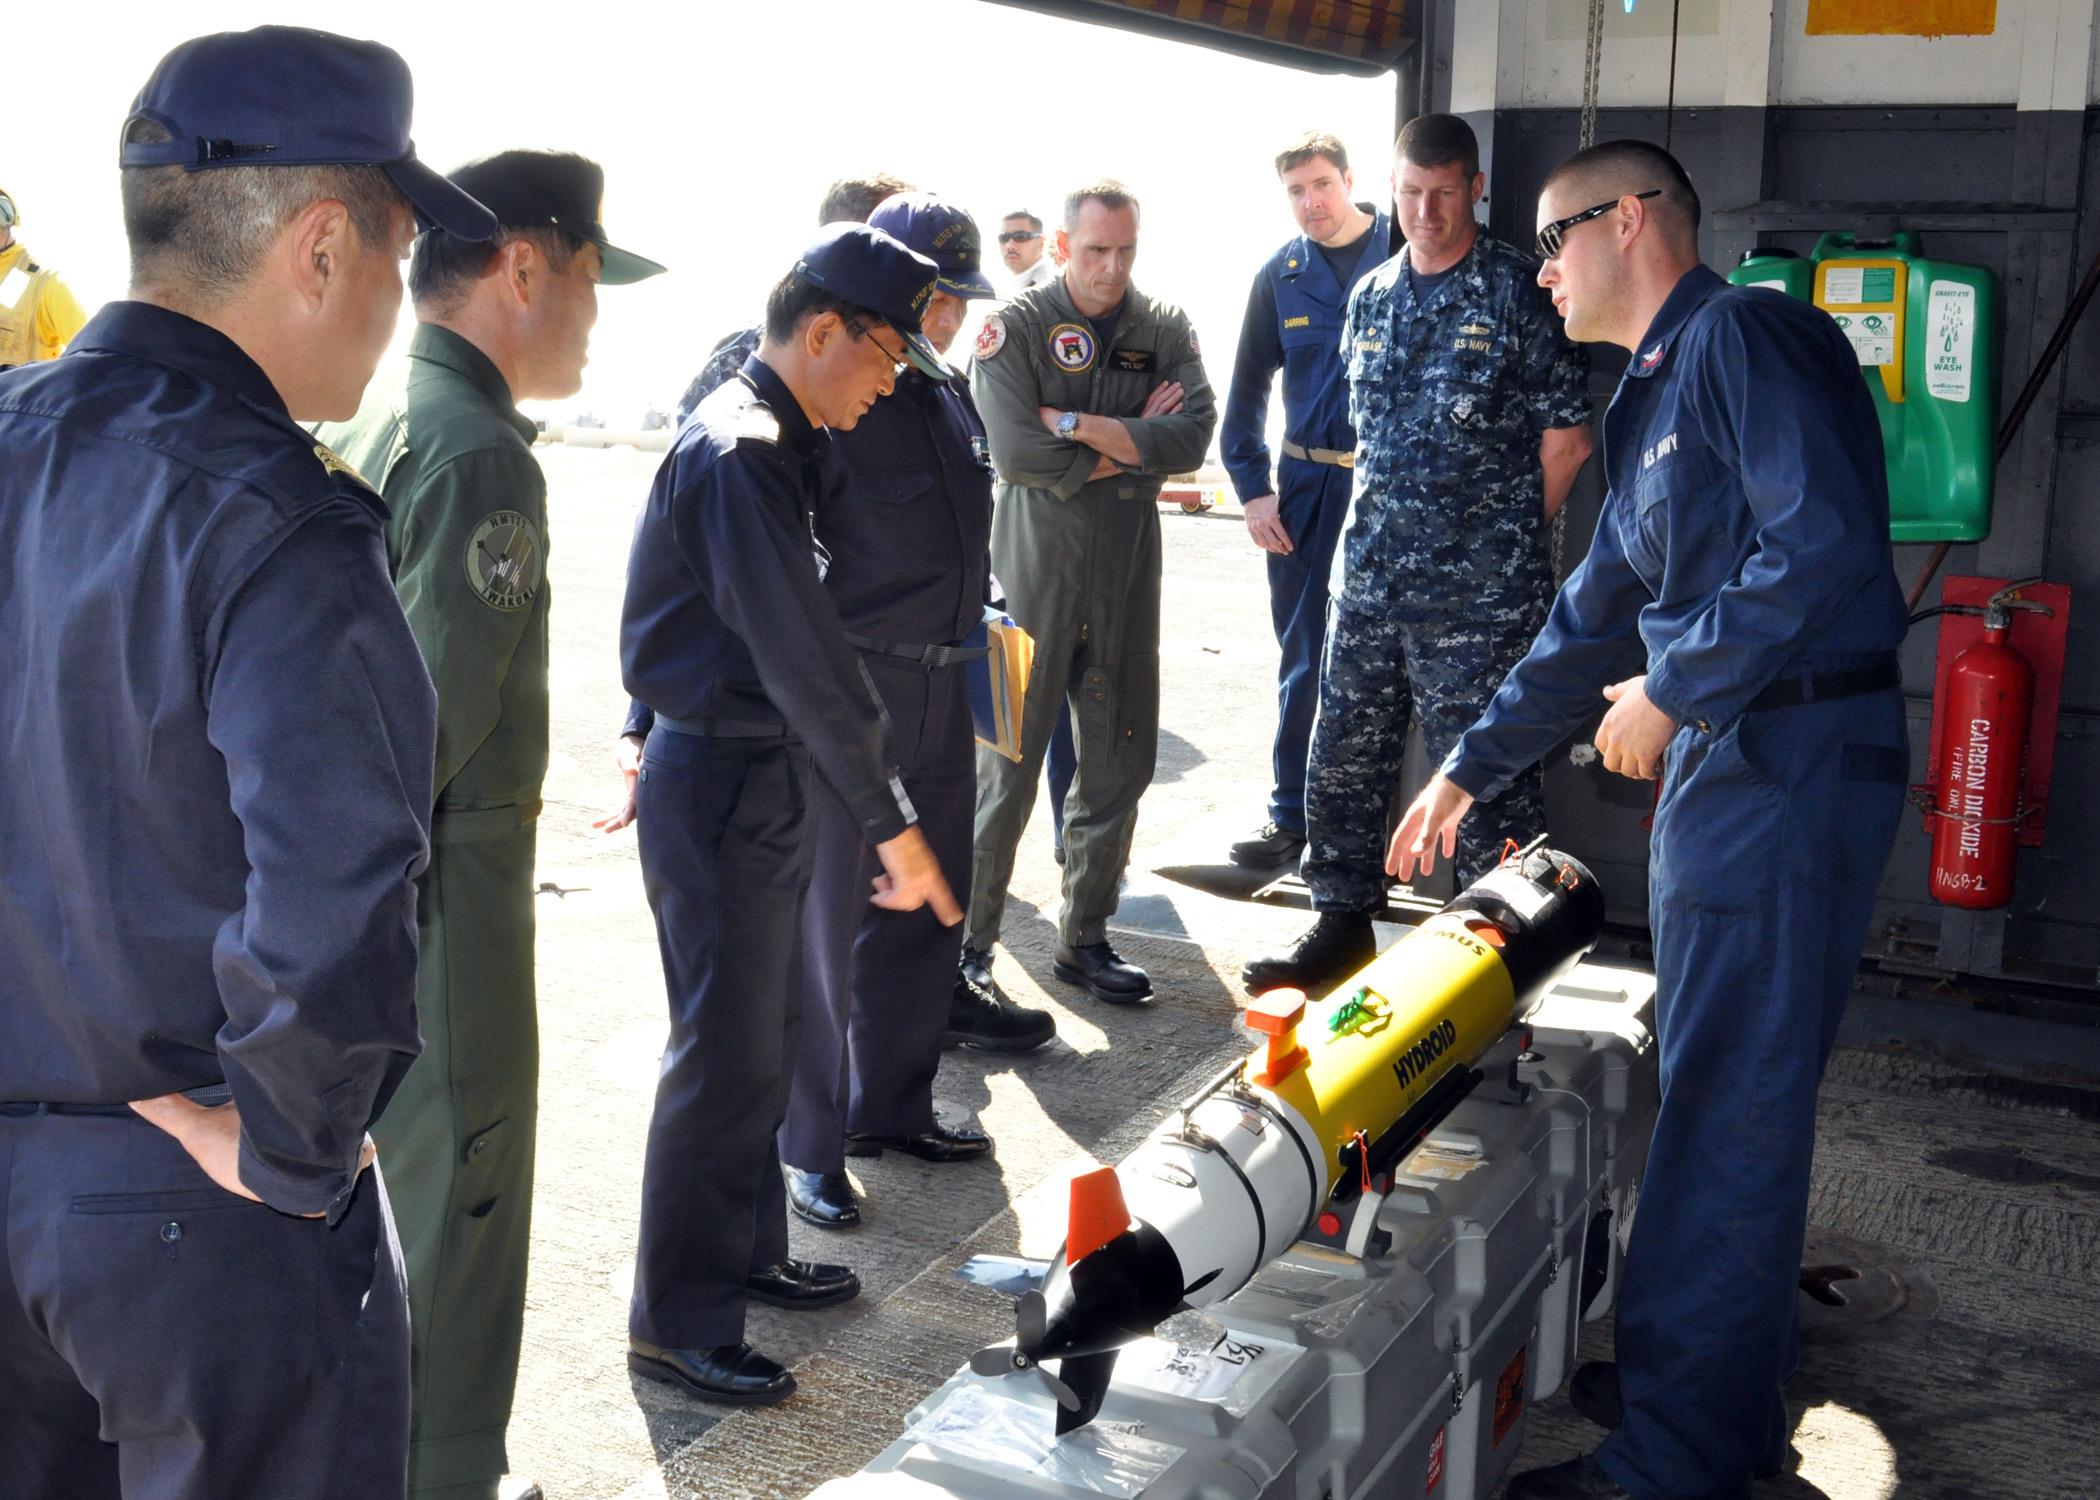 an introduction to the japanese maritime self defense force Unit/organization, address, postal code, tel no tokyo district maritime staff  office, 5-1 ichigayahonmura-cho, shinjuku-ku, tokyo, 162-8803, 03-5366-3111.